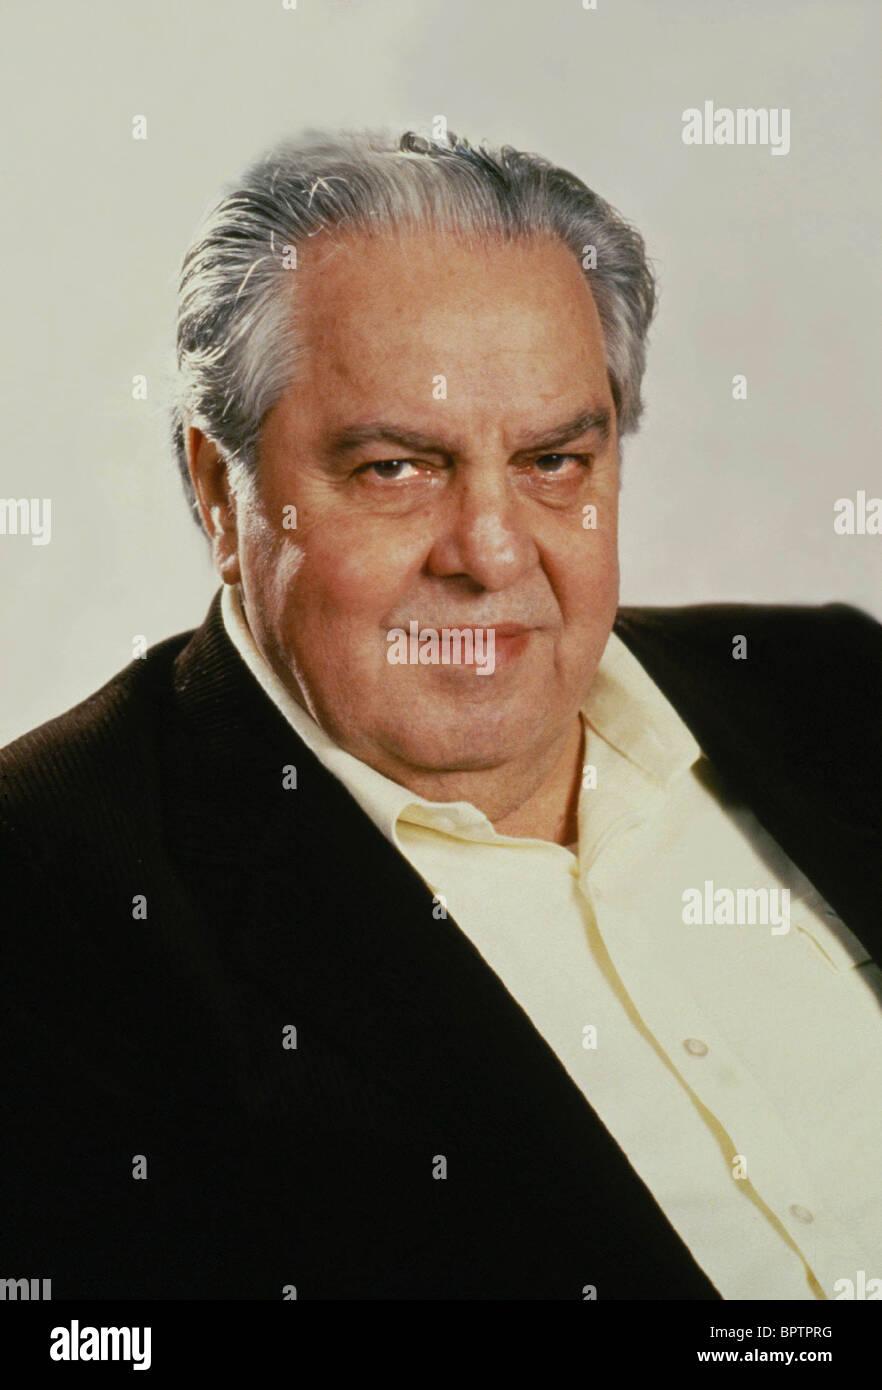 Producteur ALBERT R. Broccoli 'JAMES BOND' (1980) Photo Stock